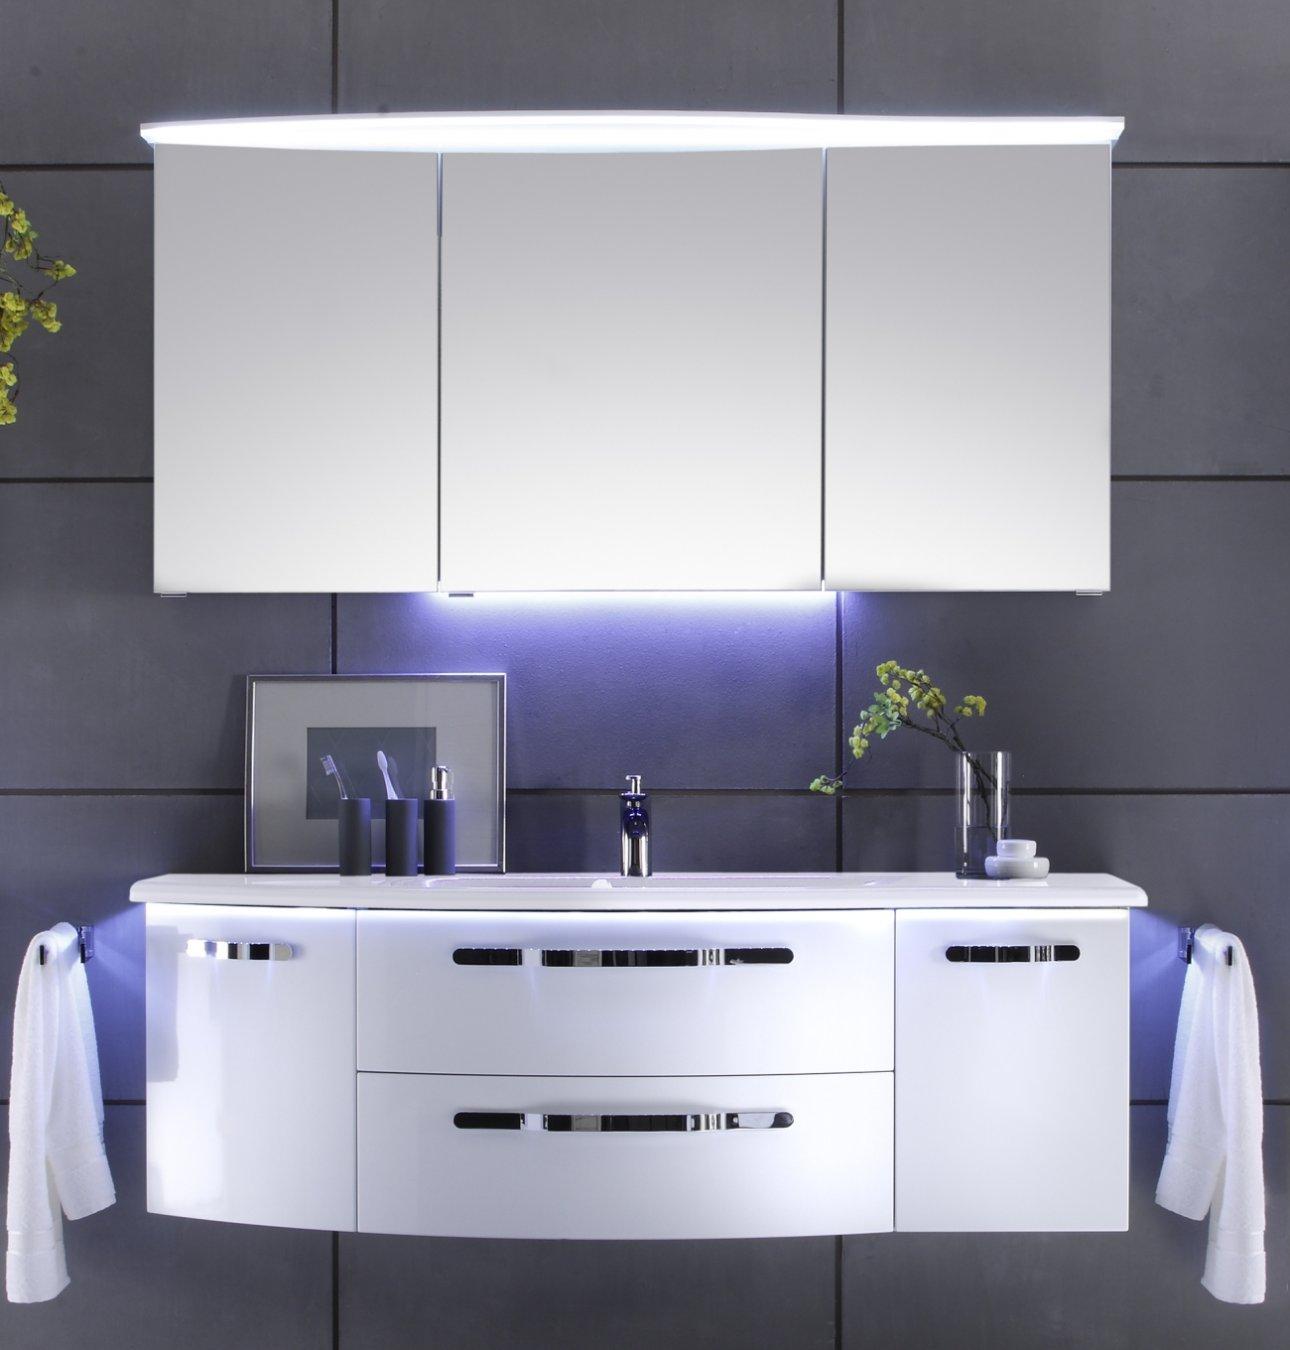 pelipal solitaire 7005 set badm bel kaufen arcom center. Black Bedroom Furniture Sets. Home Design Ideas